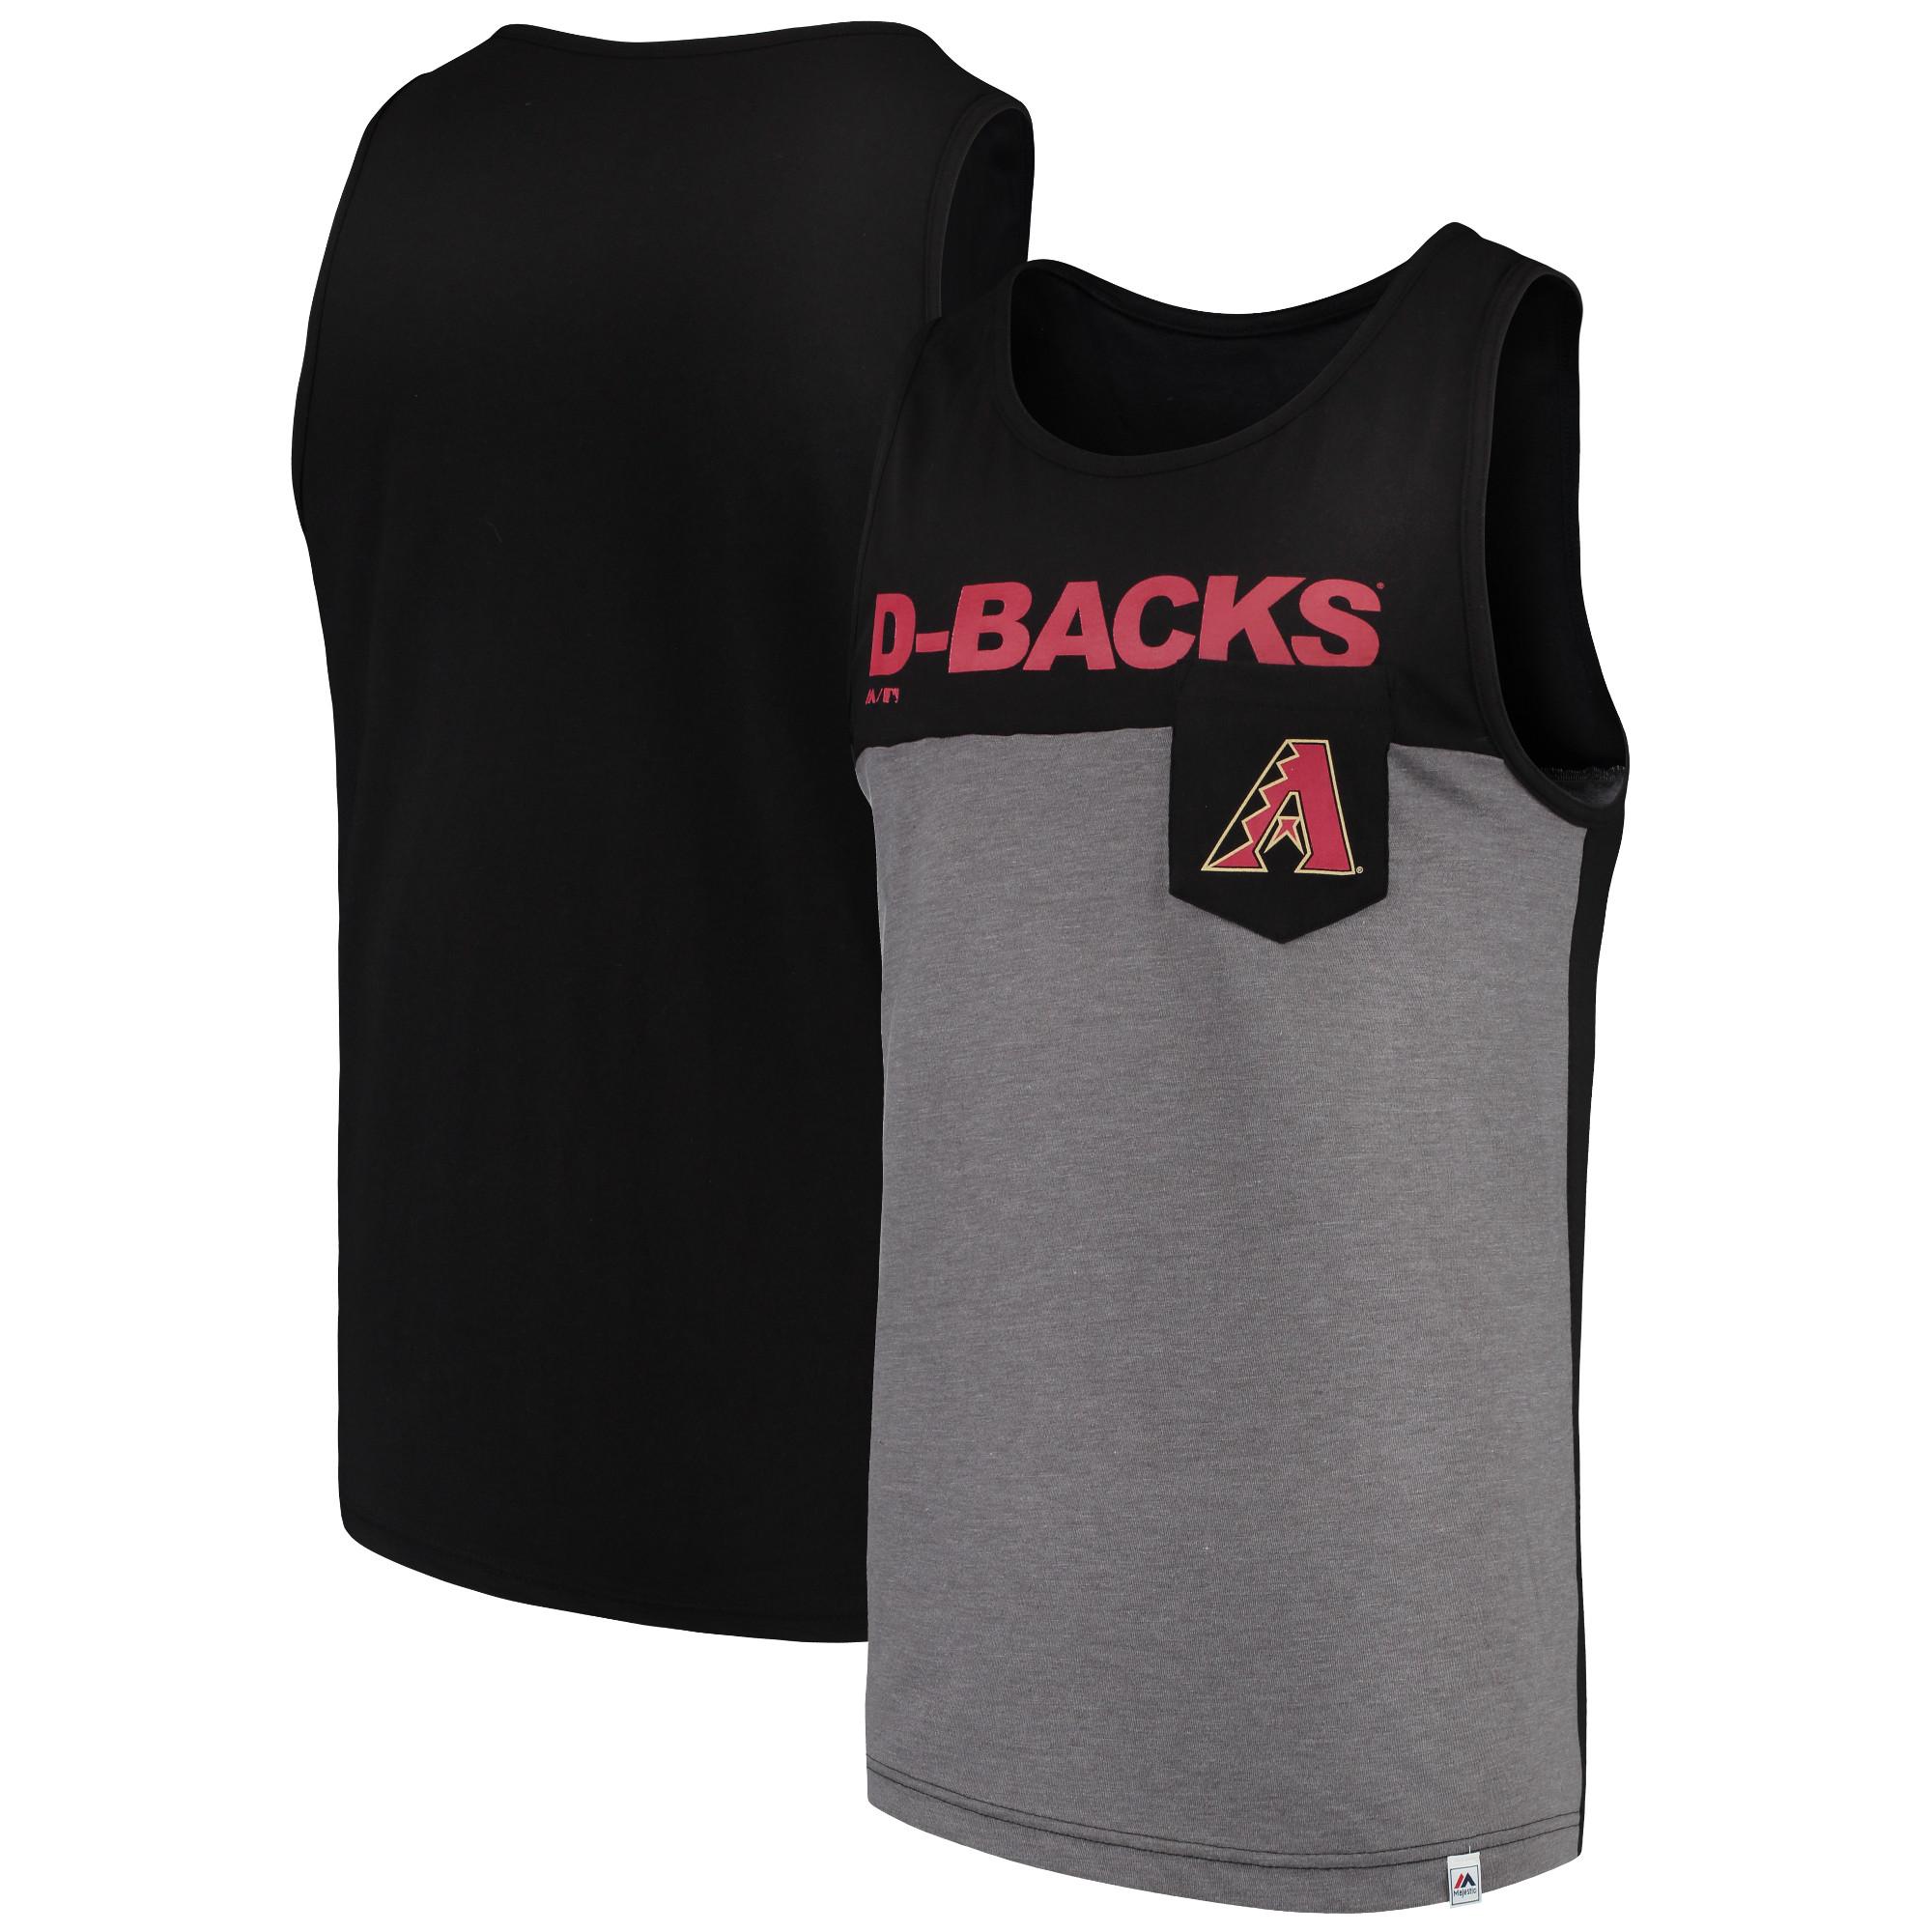 Arizona Diamondbacks Majestic Throw the Towel Pocket Tank Top - Black/Gray